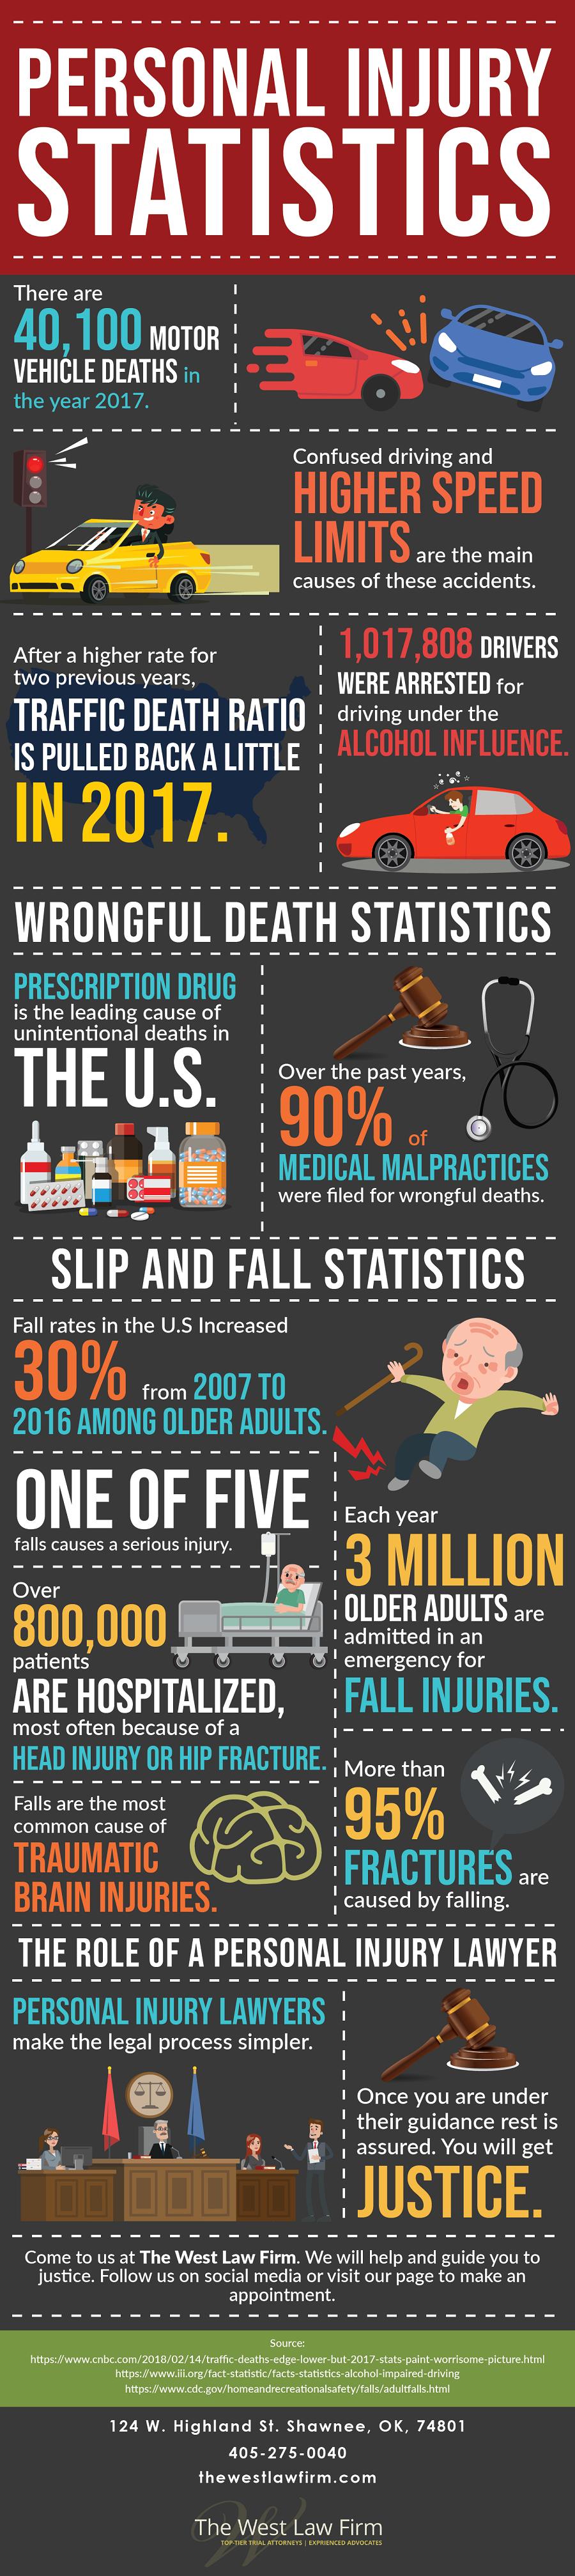 Personal Injury Statistics